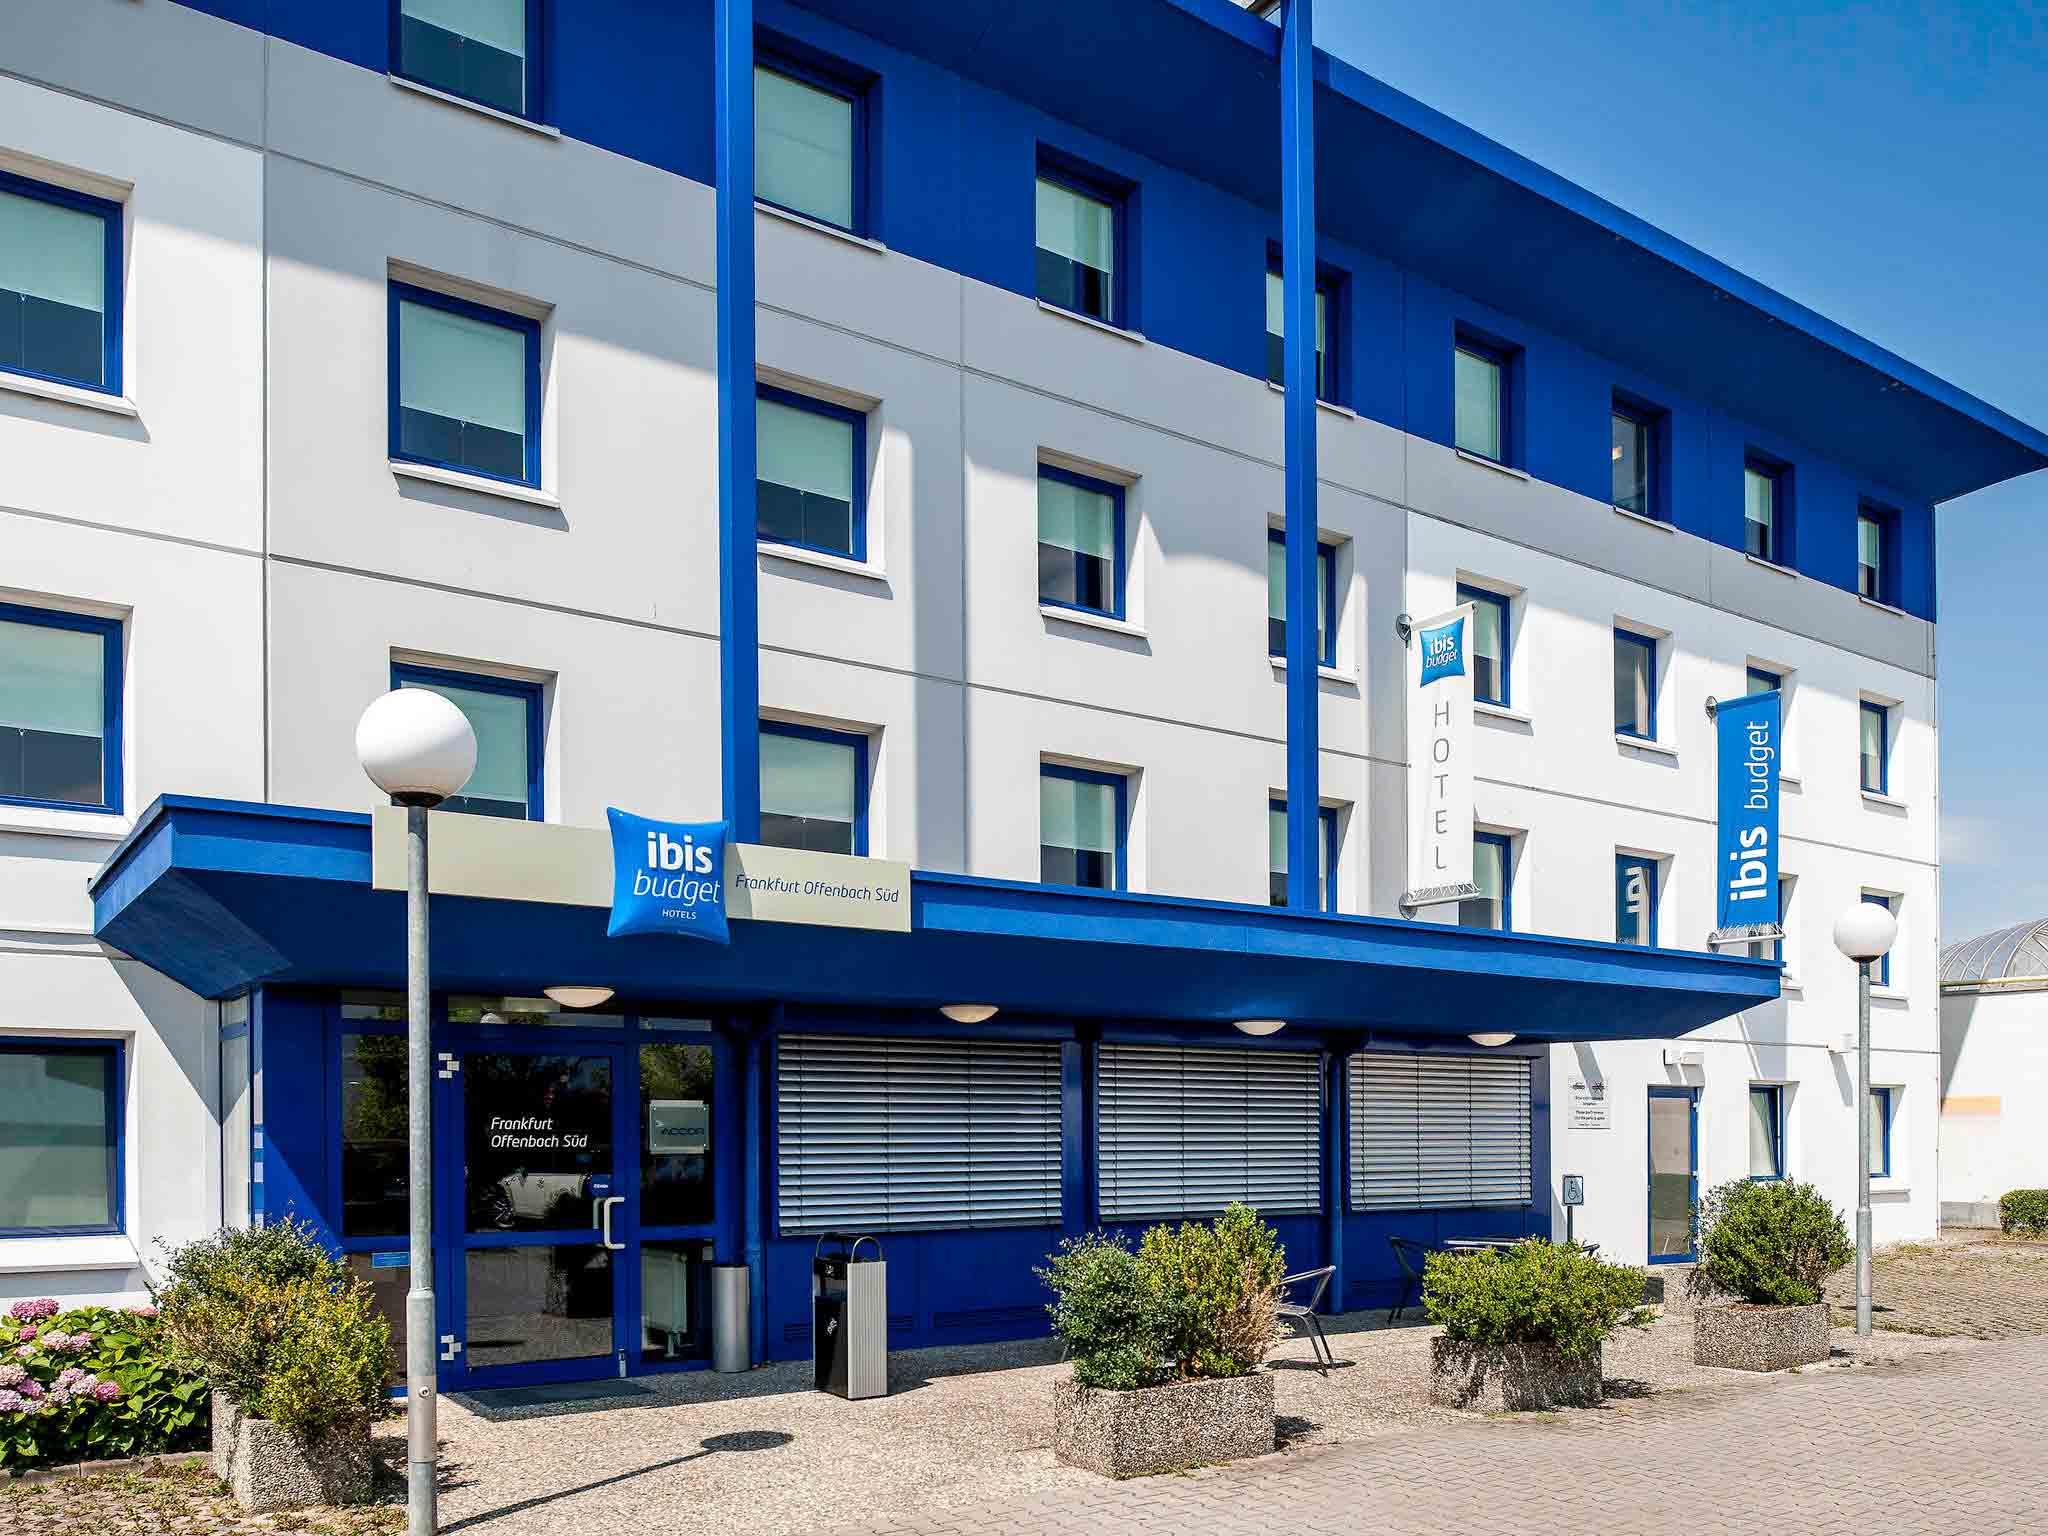 Hotel – ibis budget Frankfurt Offenbach Sued